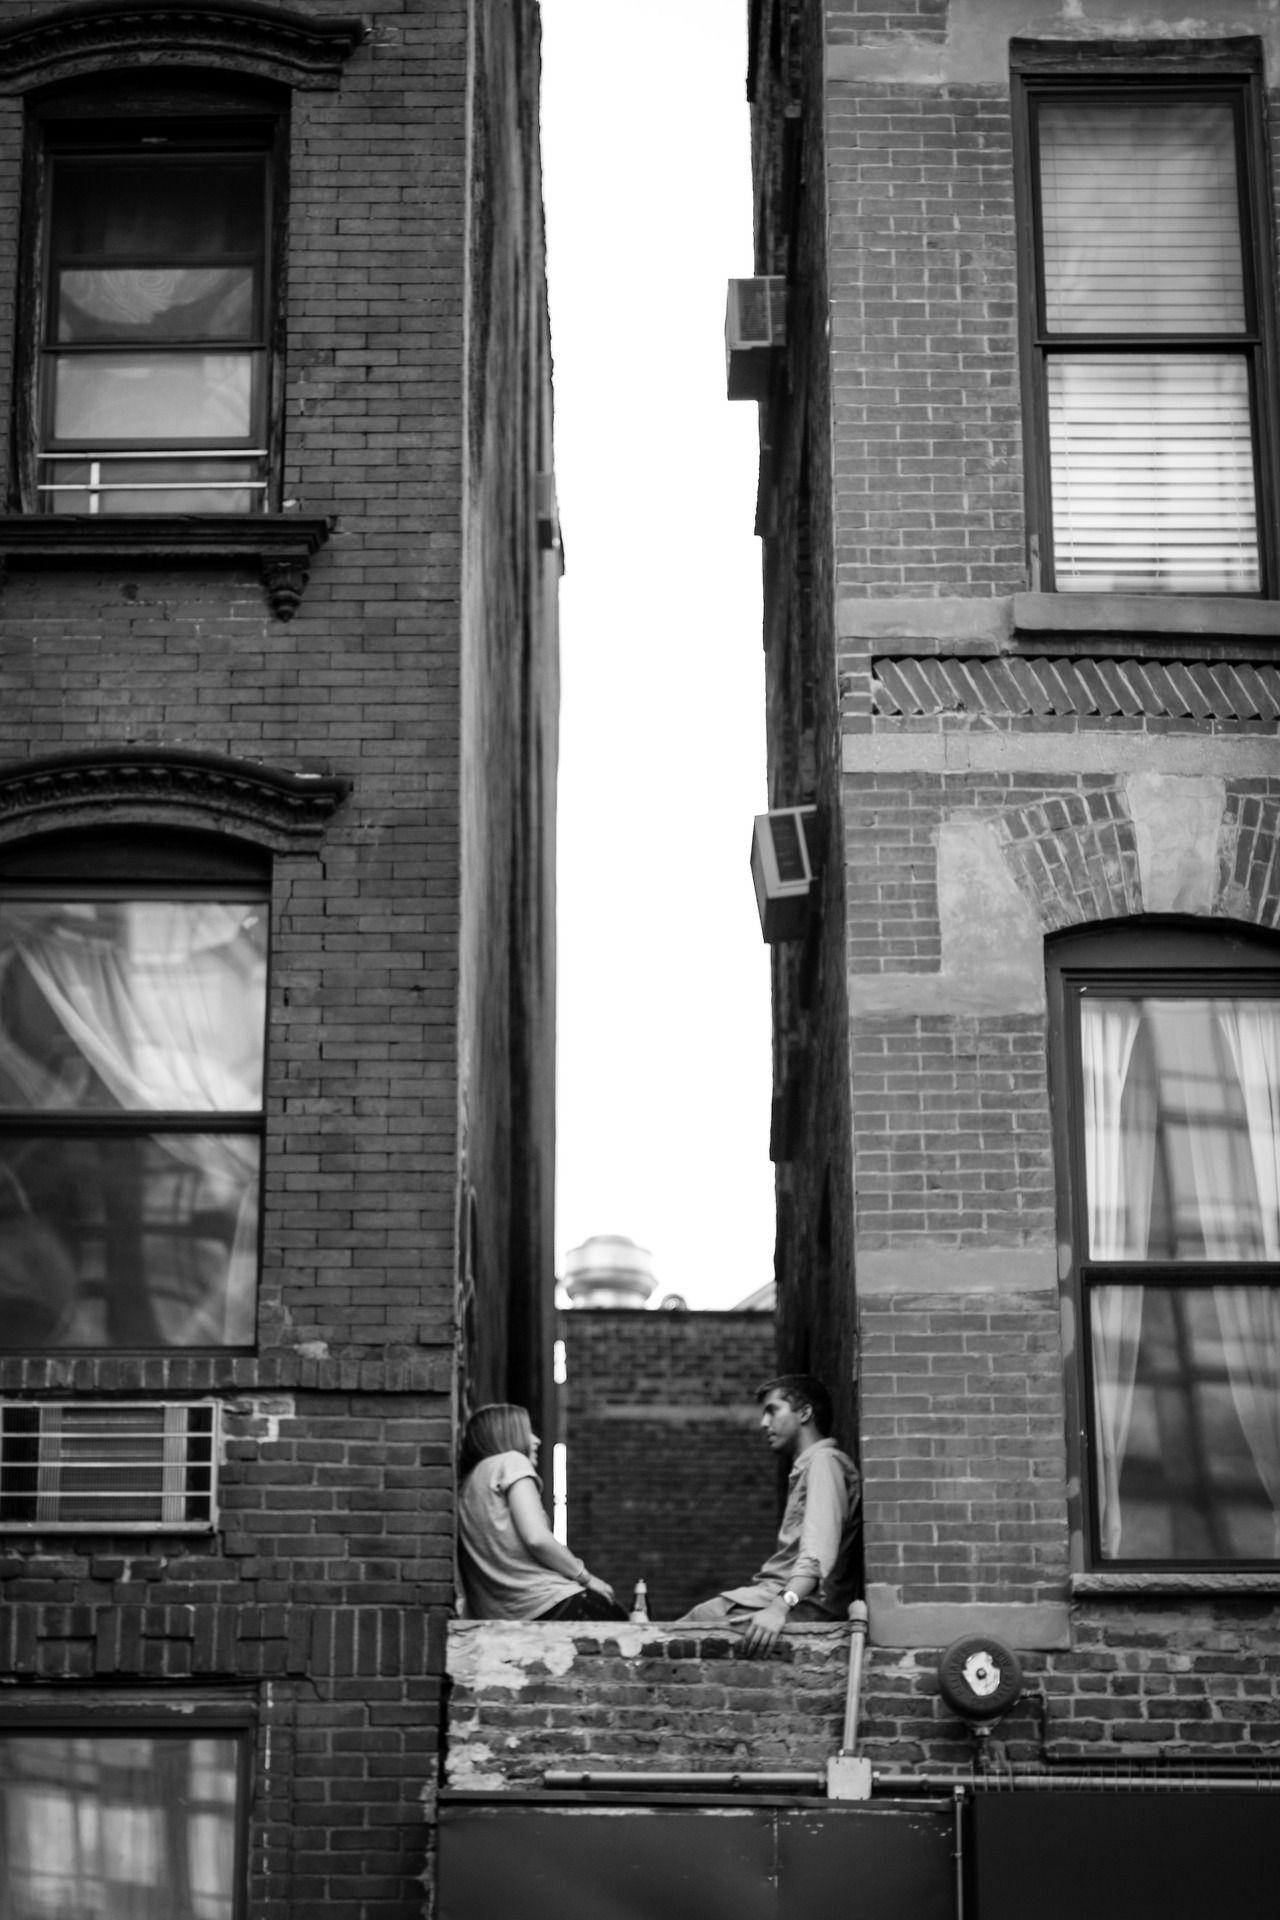 New York City, United States, 2013 daniosorio.com